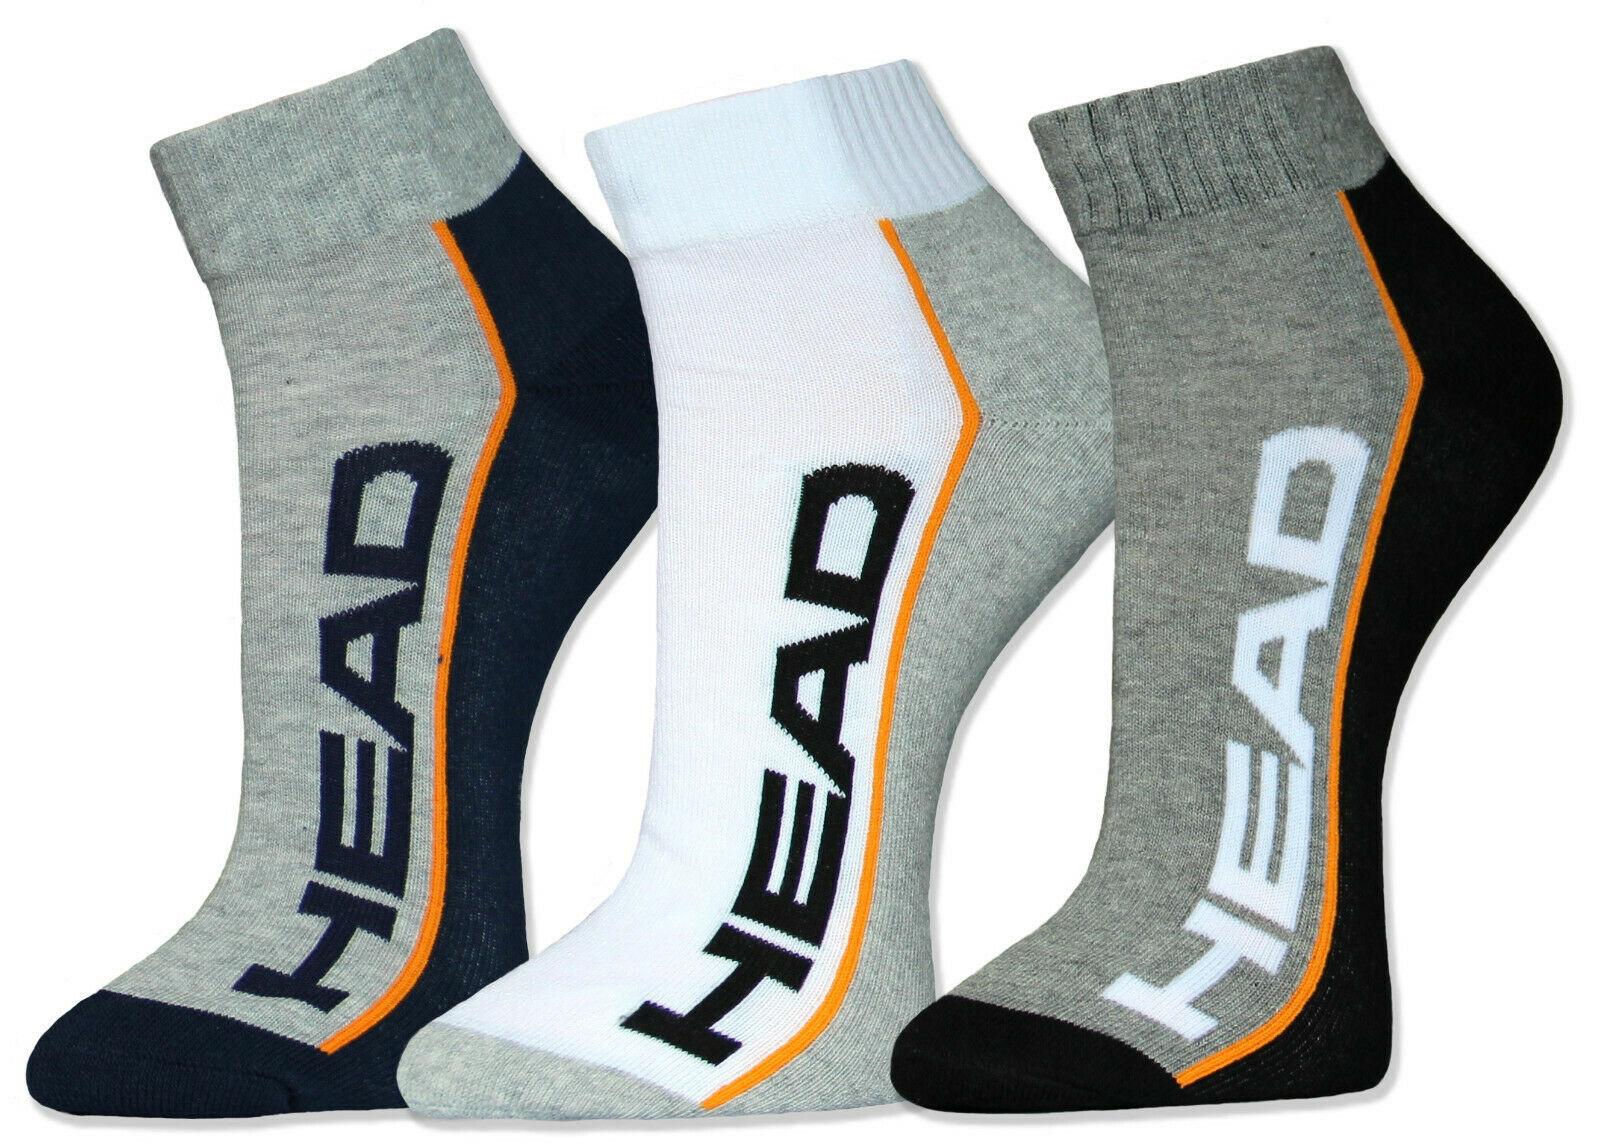 HEAD Sportsocken Quarter Kurzschaft Socken 2 / 4 / 6 Paar Frotteesohle Kurzsocke